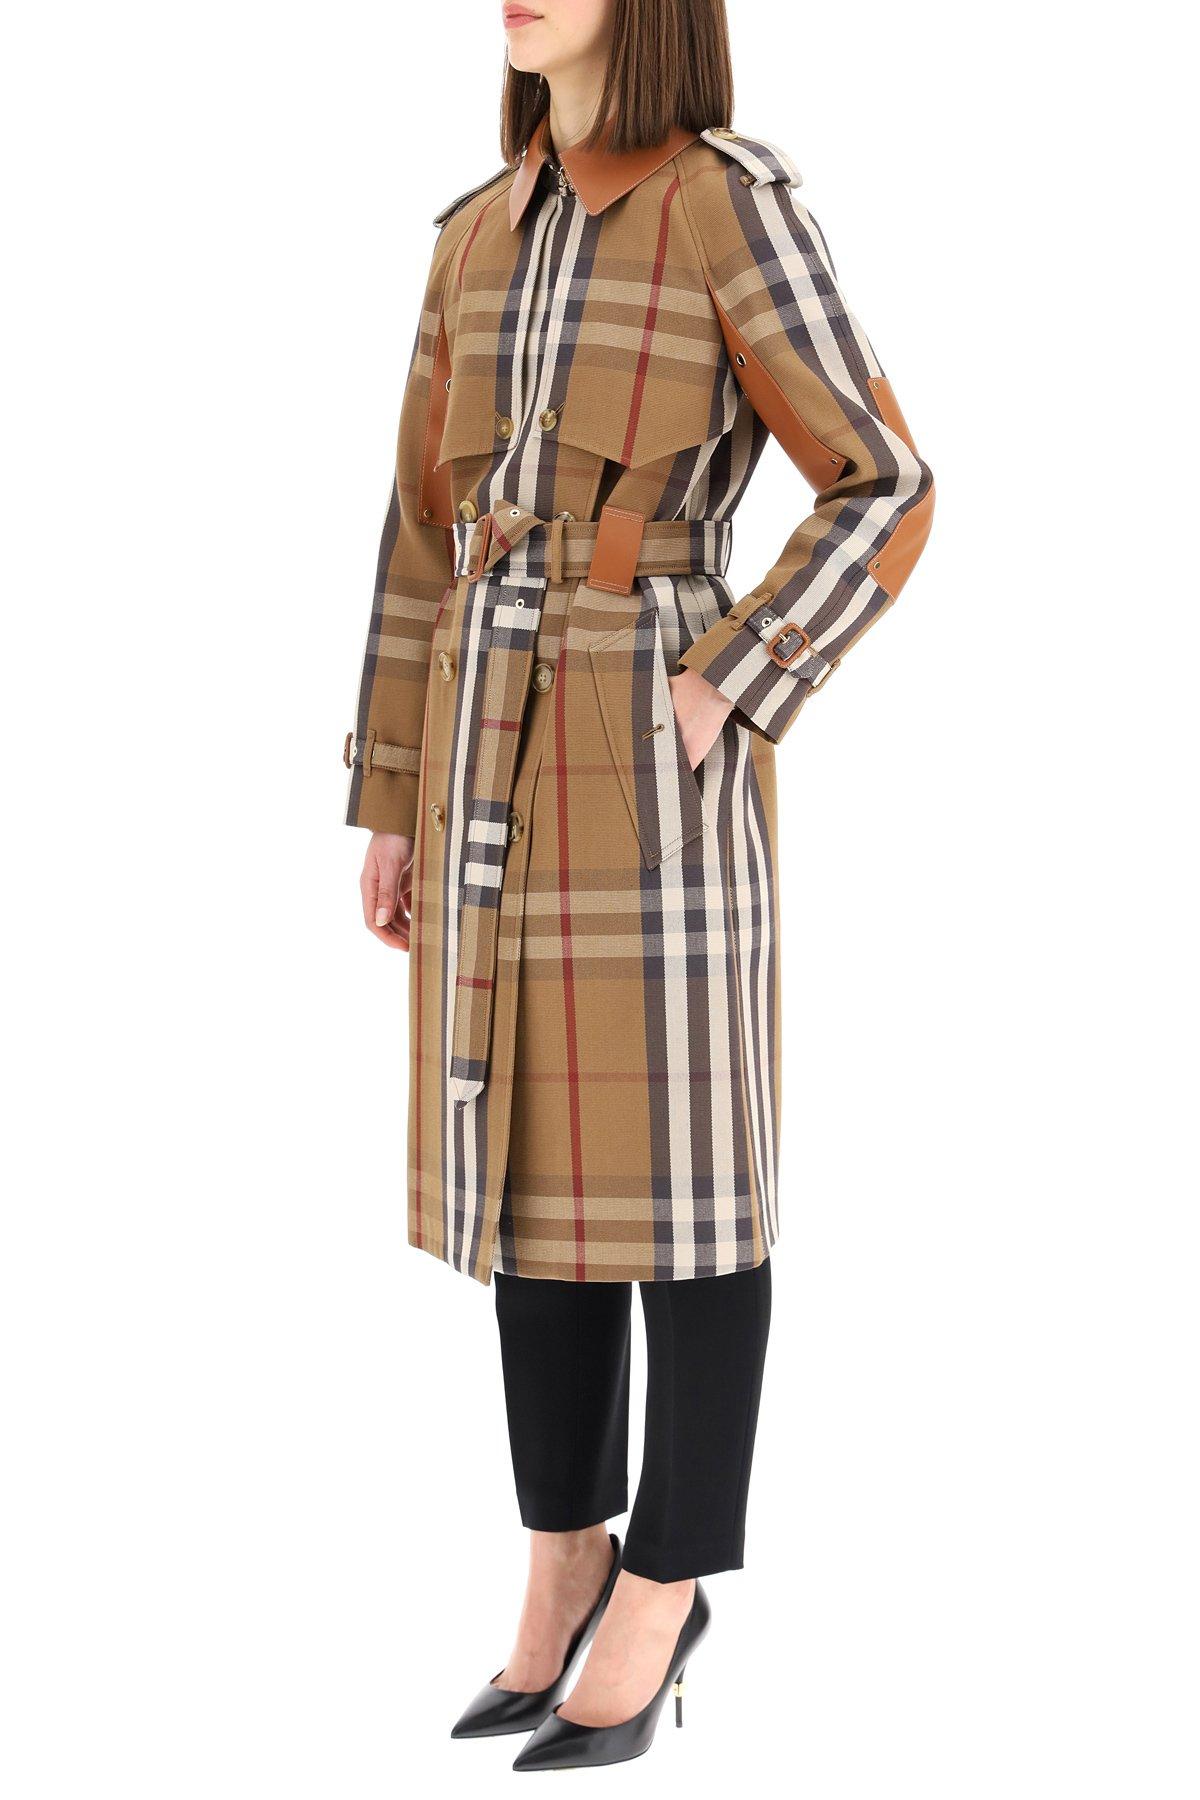 Burberry trench coat rainham con dettagli in pelle